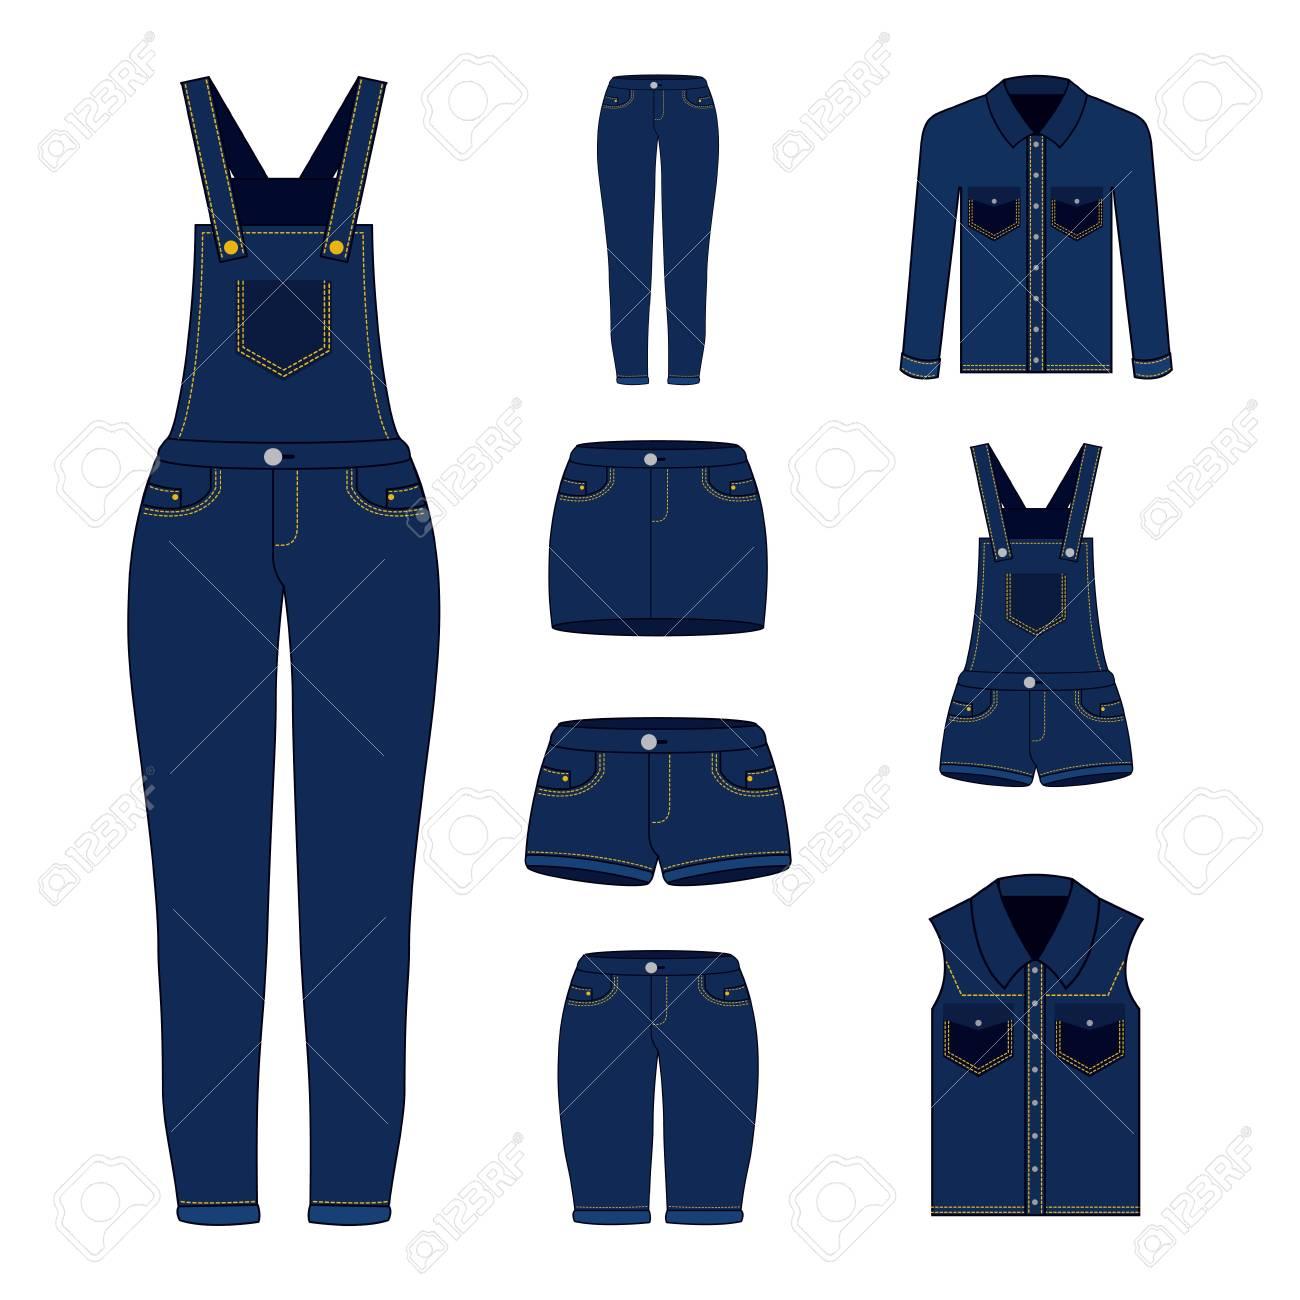 denim women clothes set blue jean shorts overalls skirt jacket and vest vector illustration - 98191217